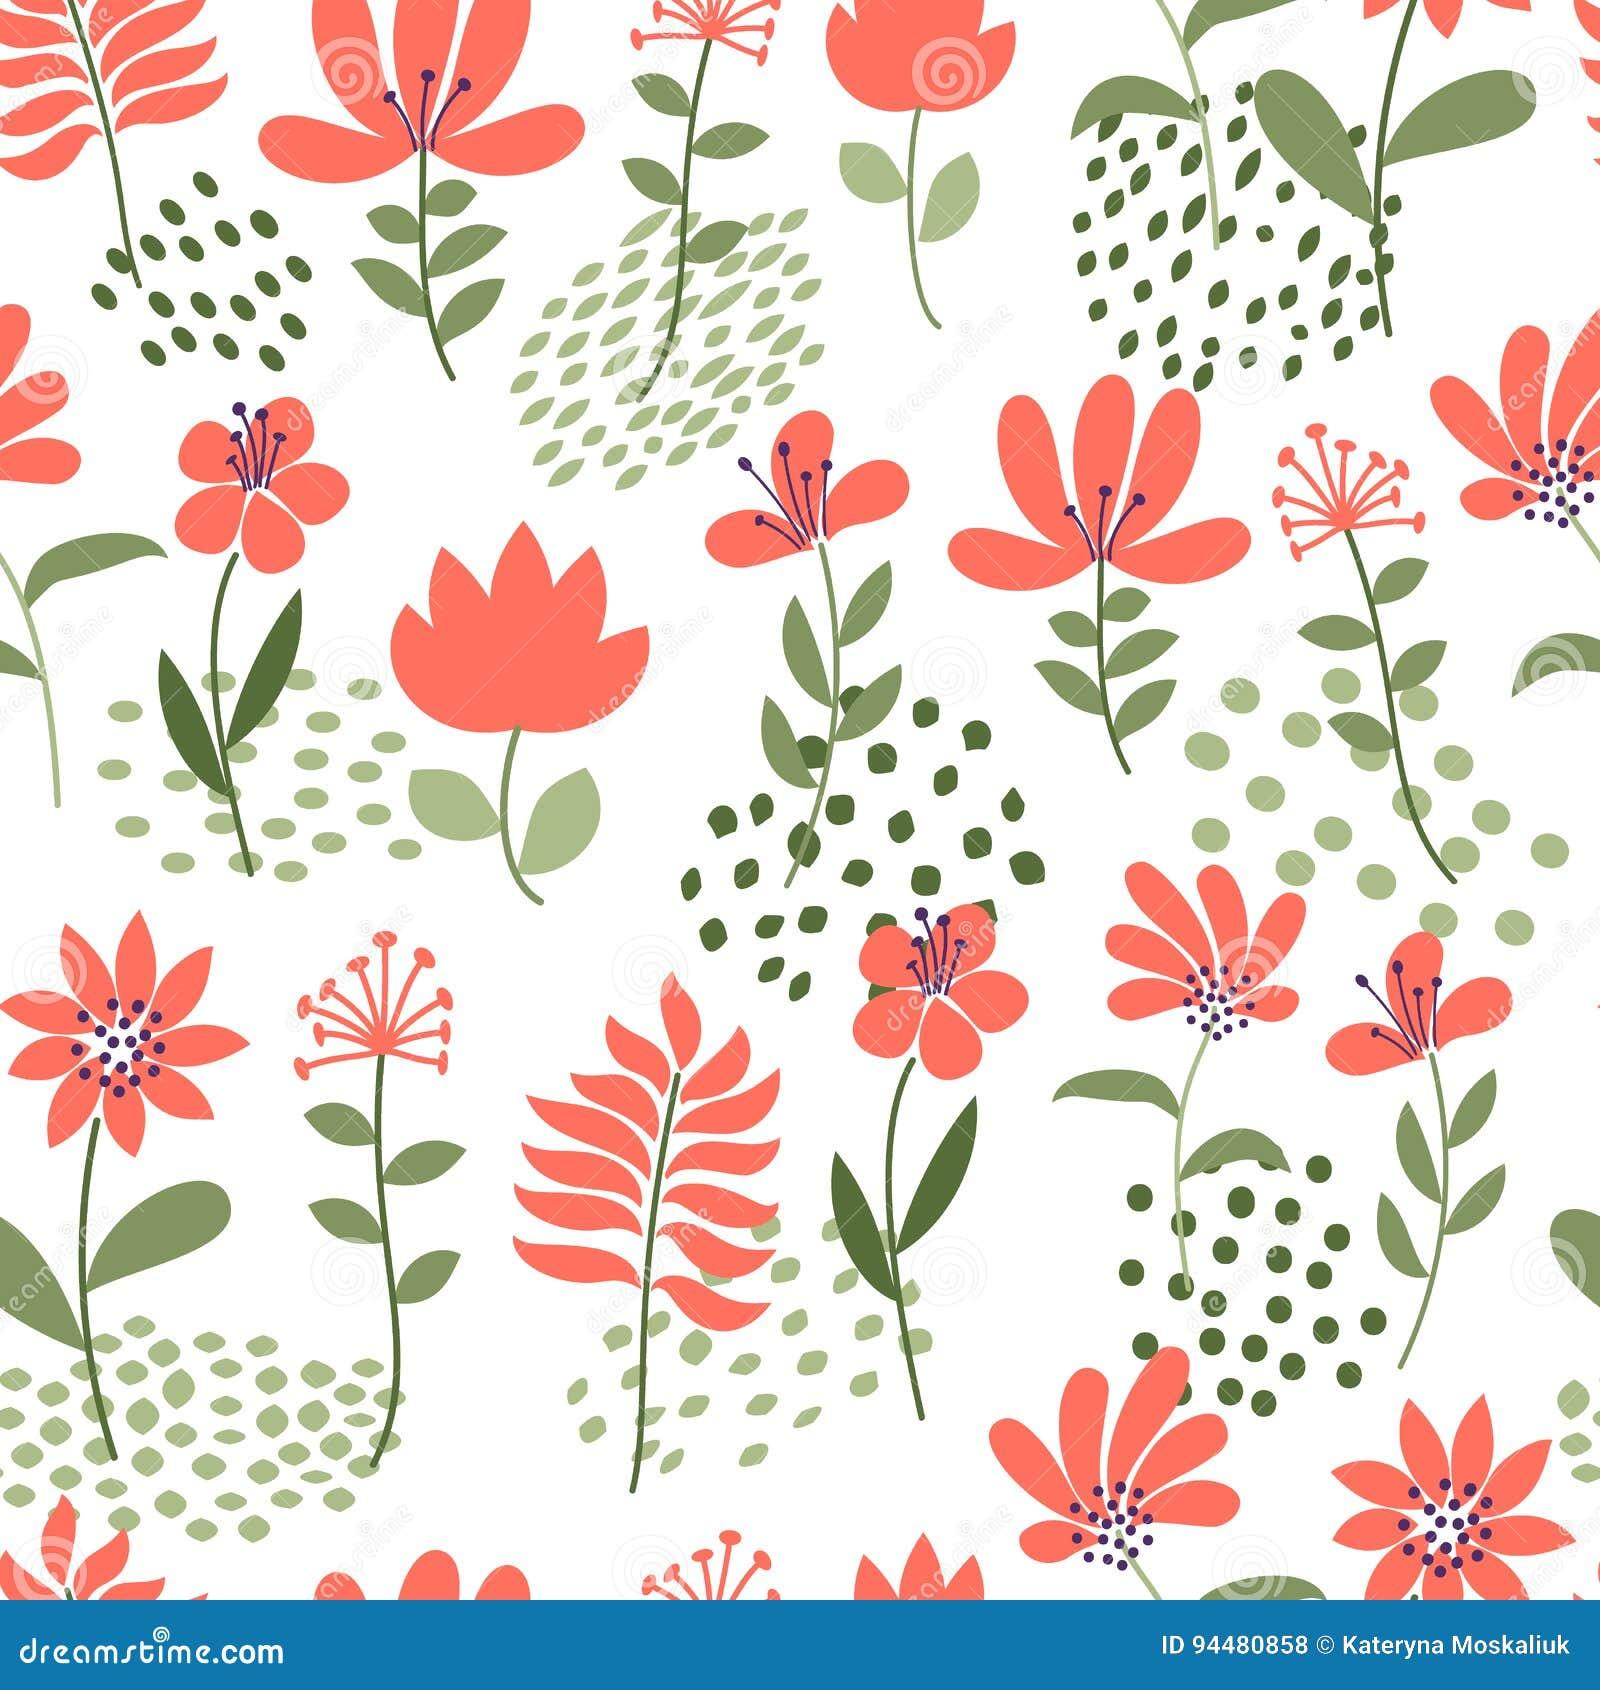 Simple Flower P...